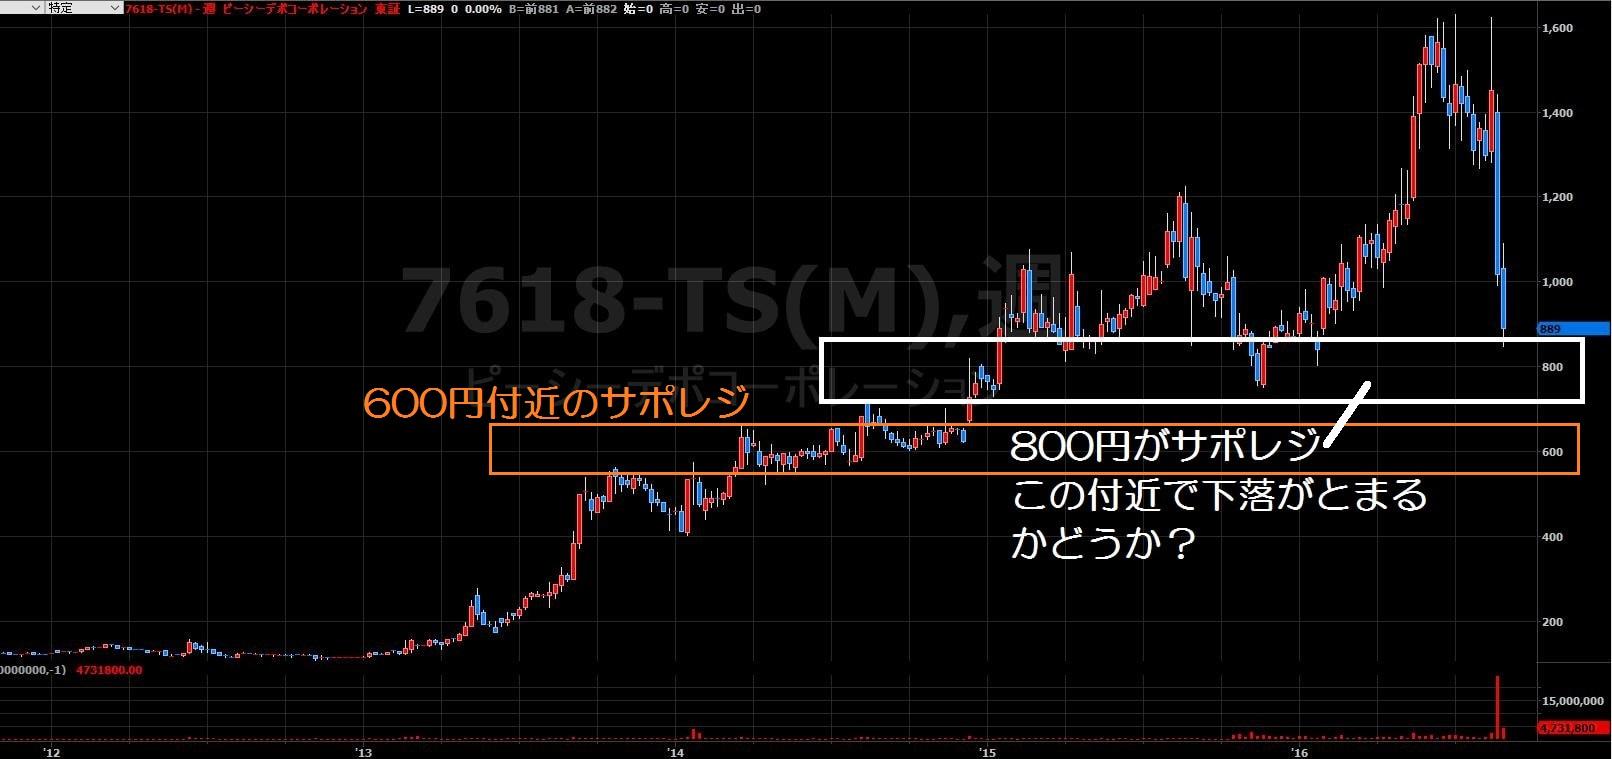 16.8.24PCデポ株価-今後のポイント-min